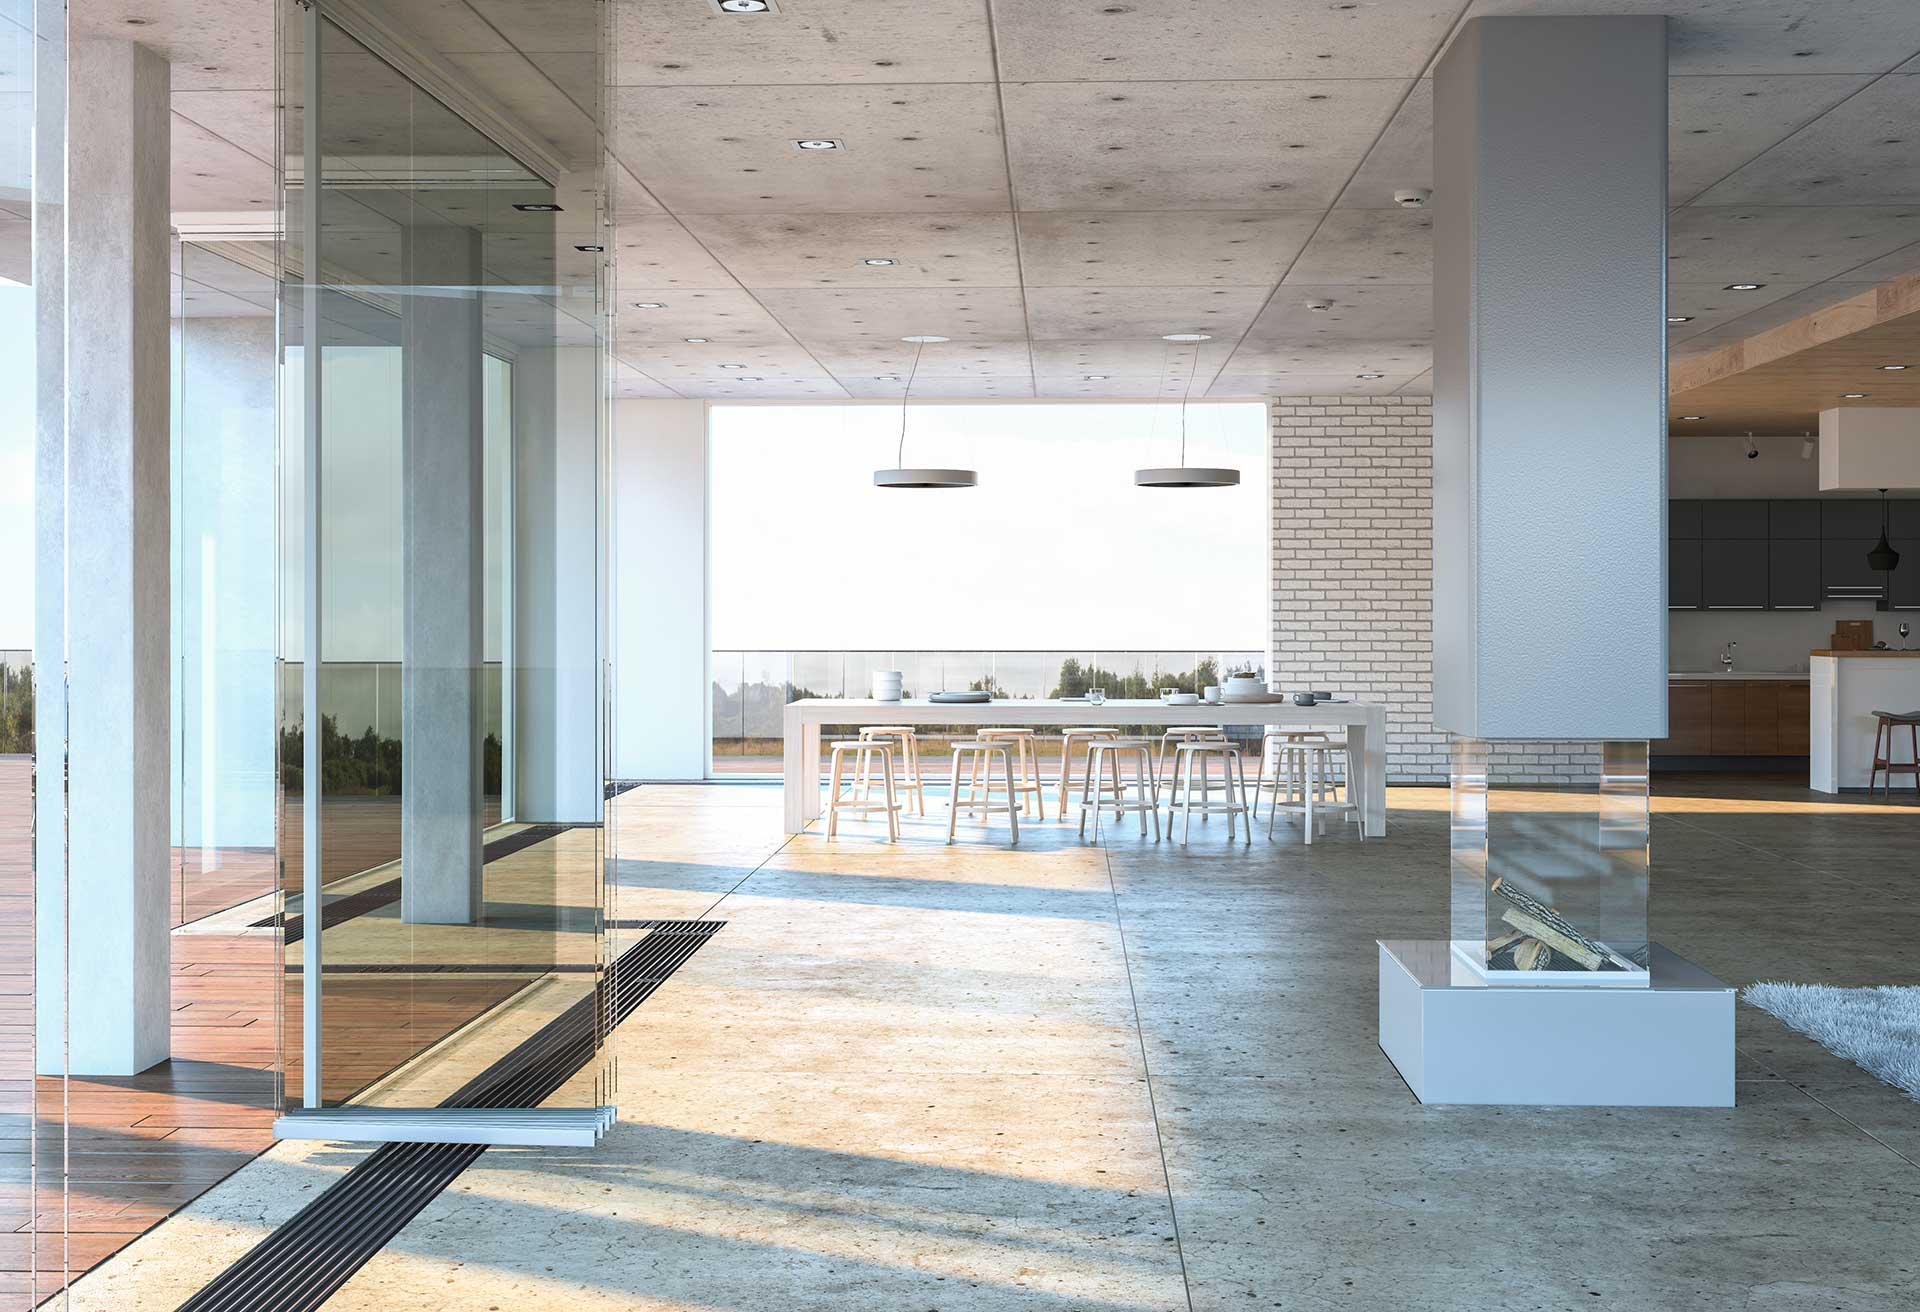 glass-entrance-to-modern-house-PHWJQQ2